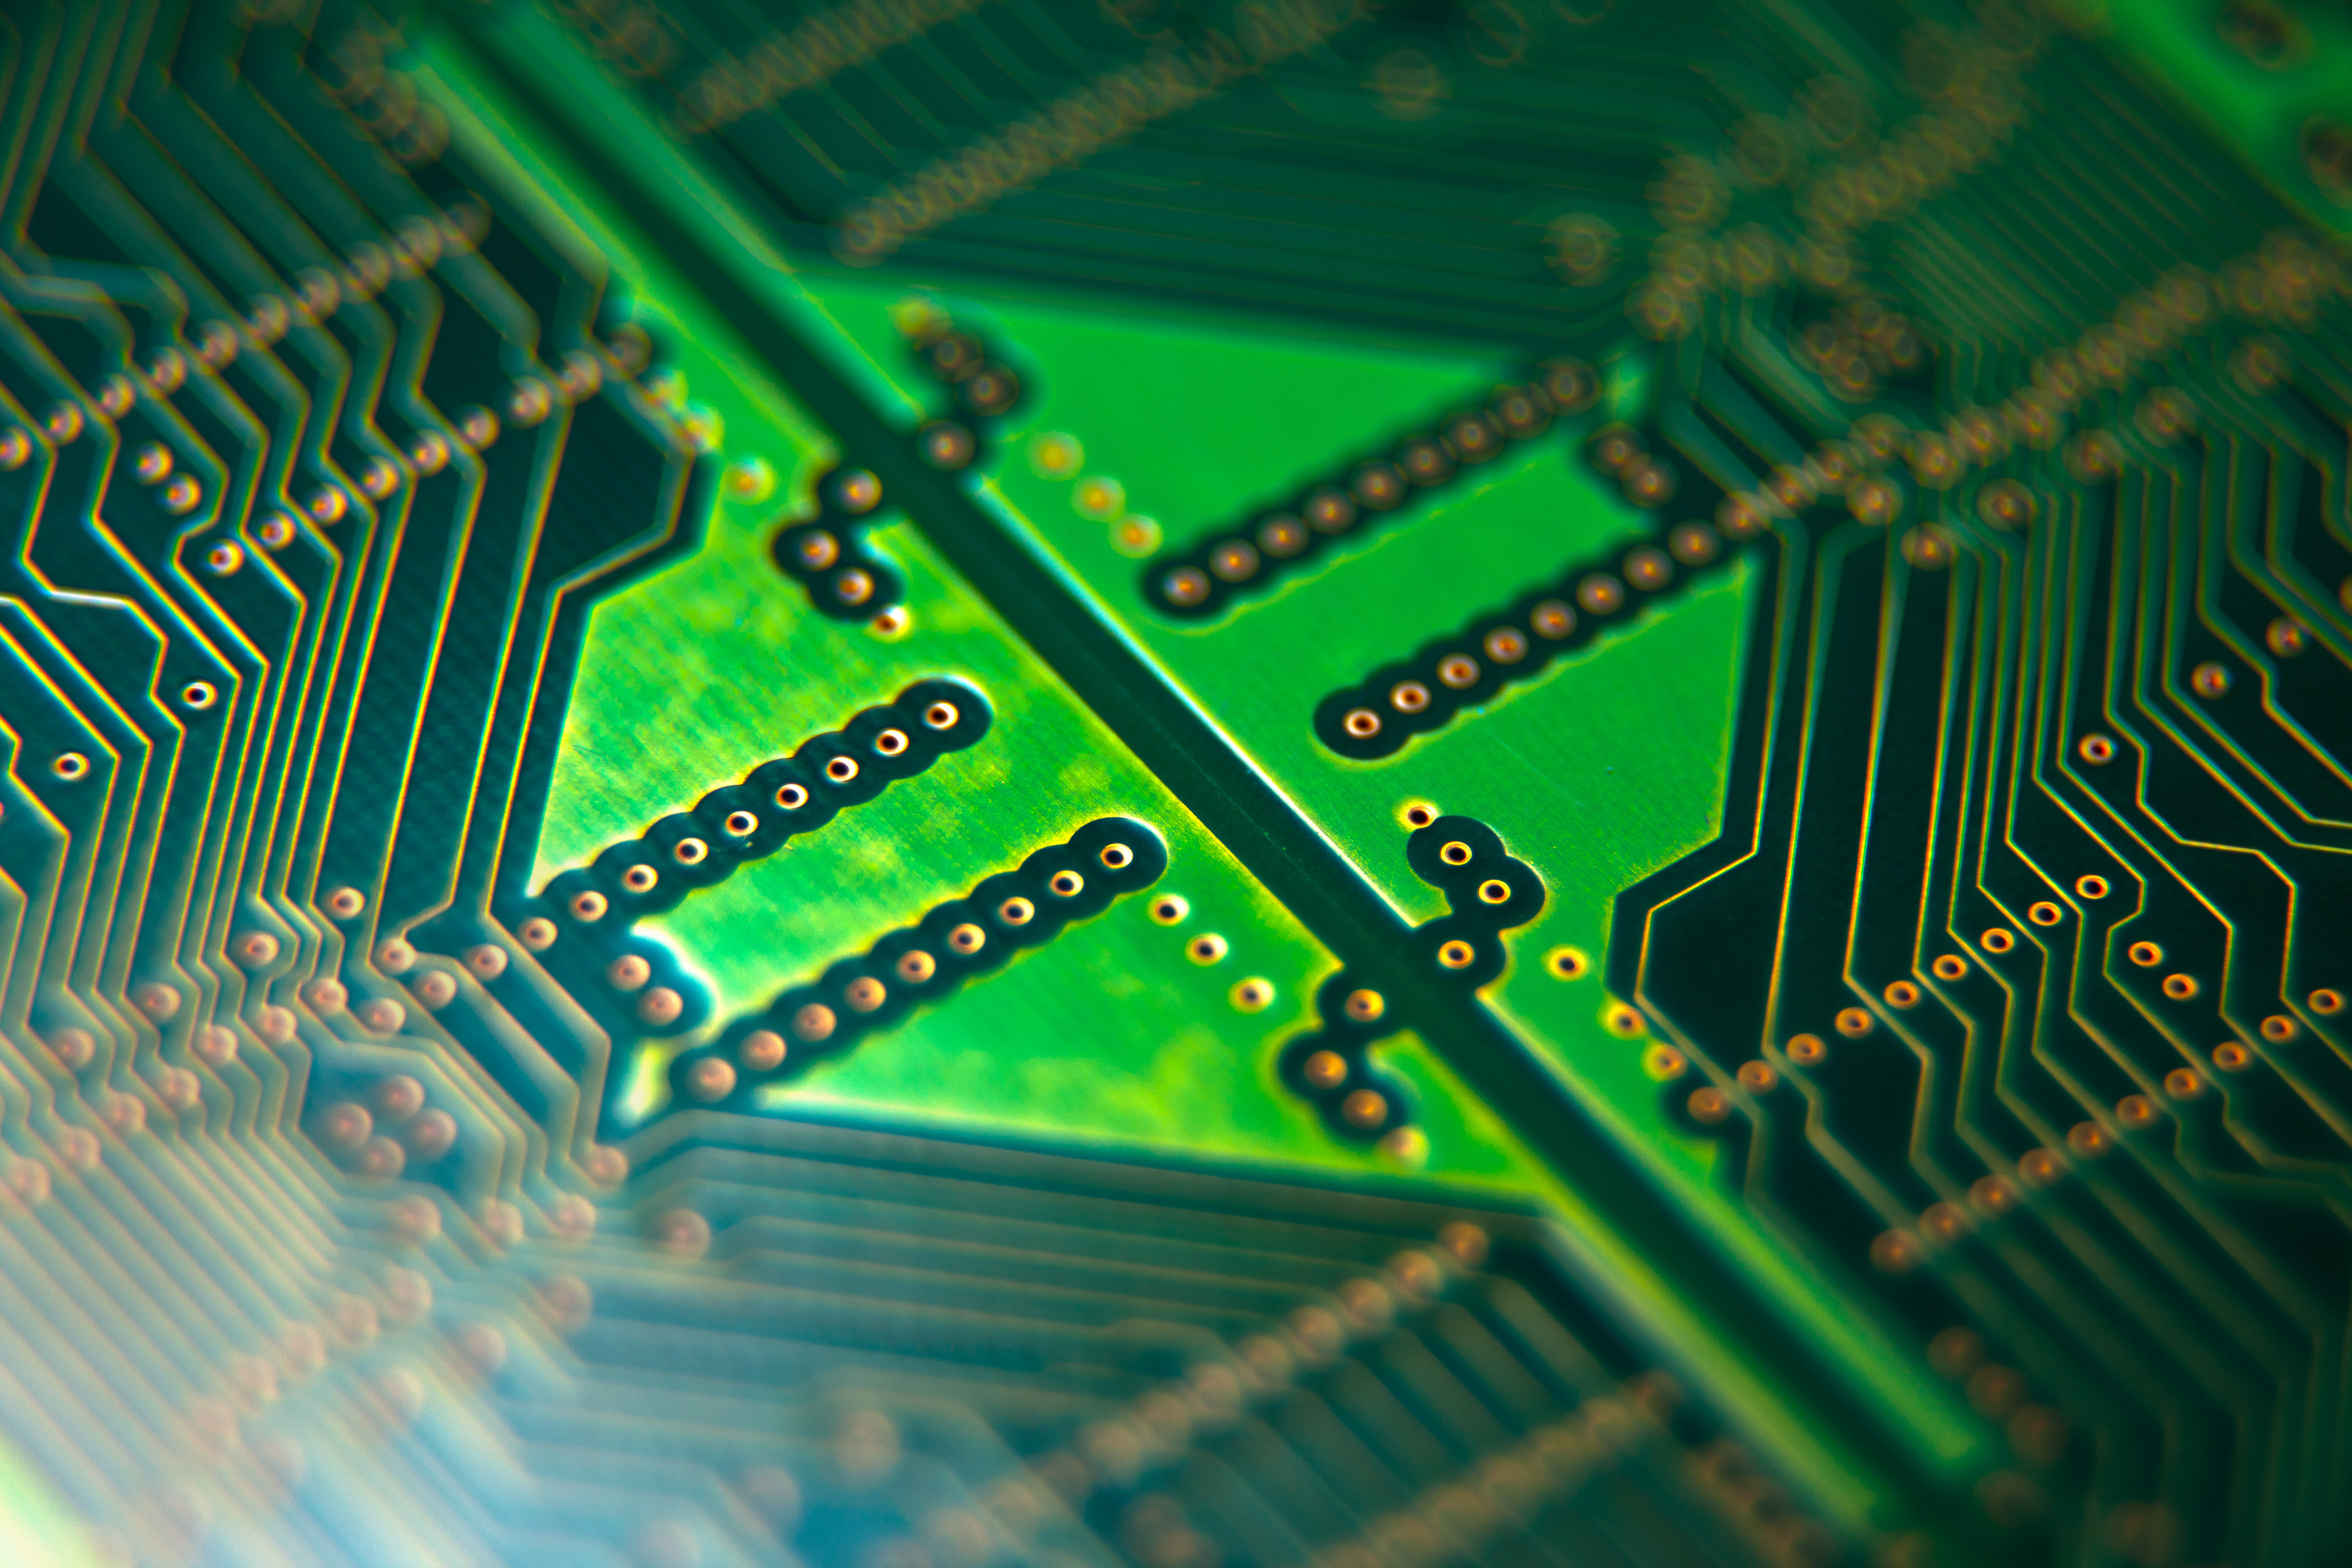 Computer circuit board photo